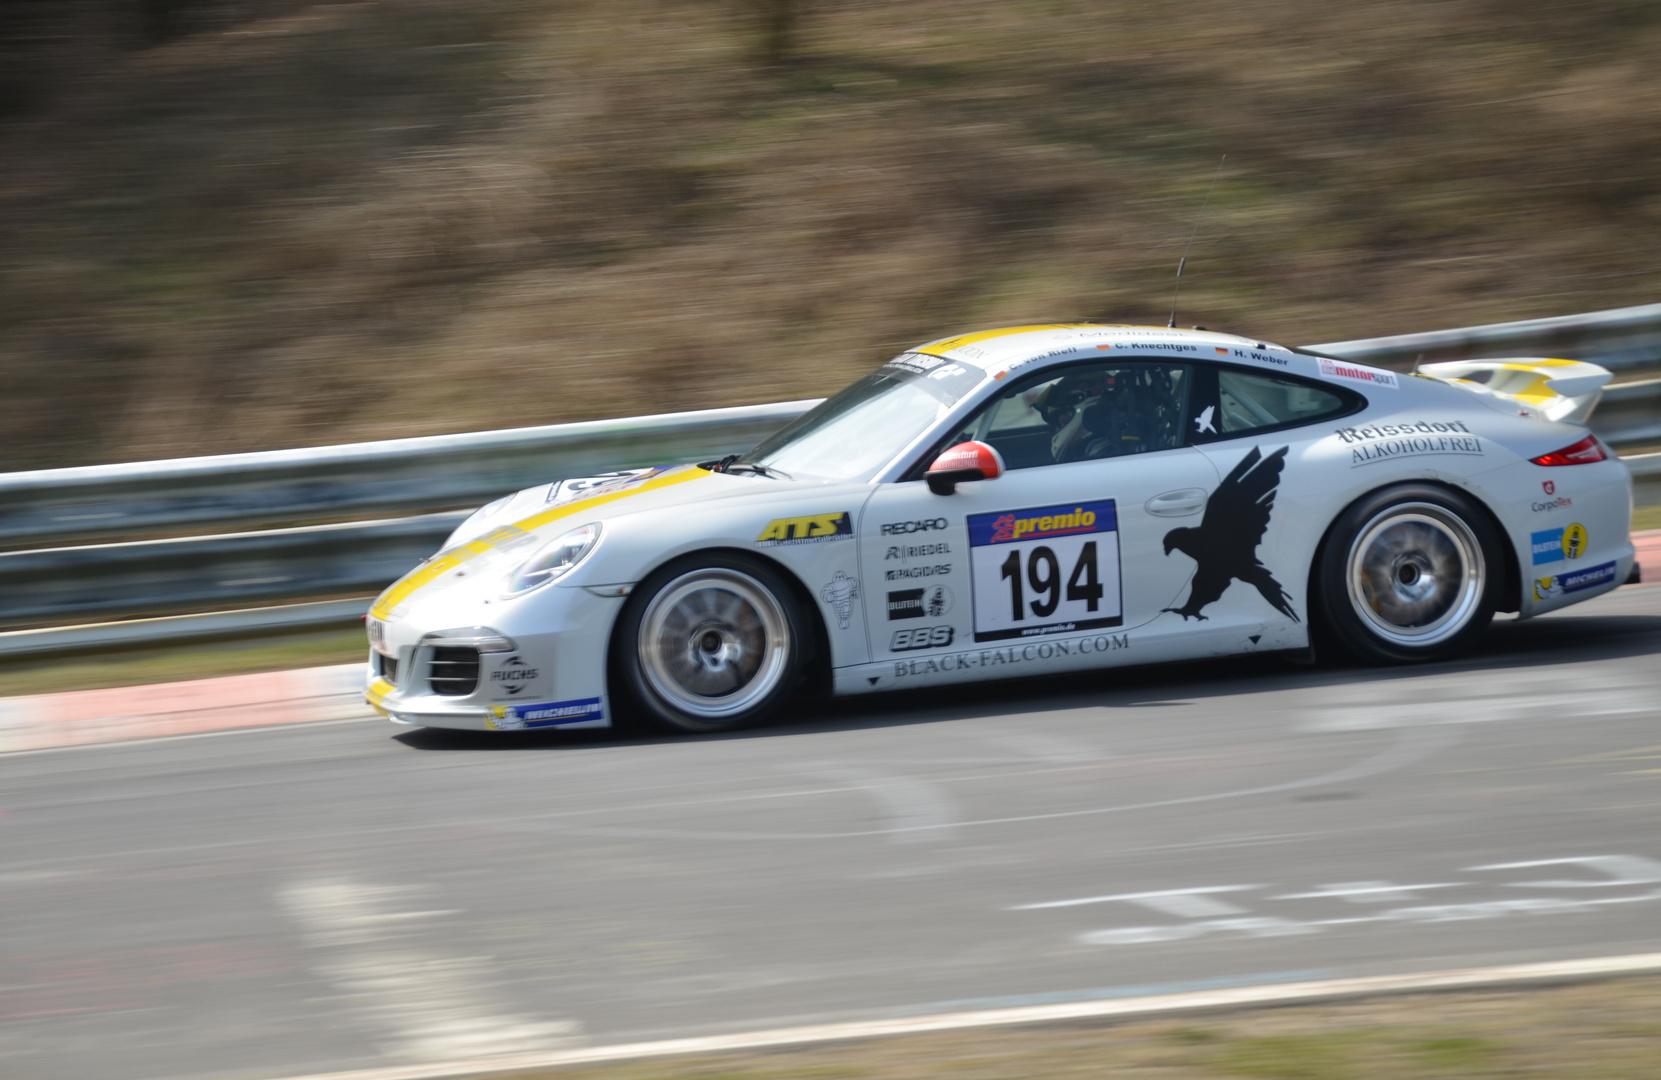 Nordschleife Nürburgring (VLN am29.03.2014) Teil 2